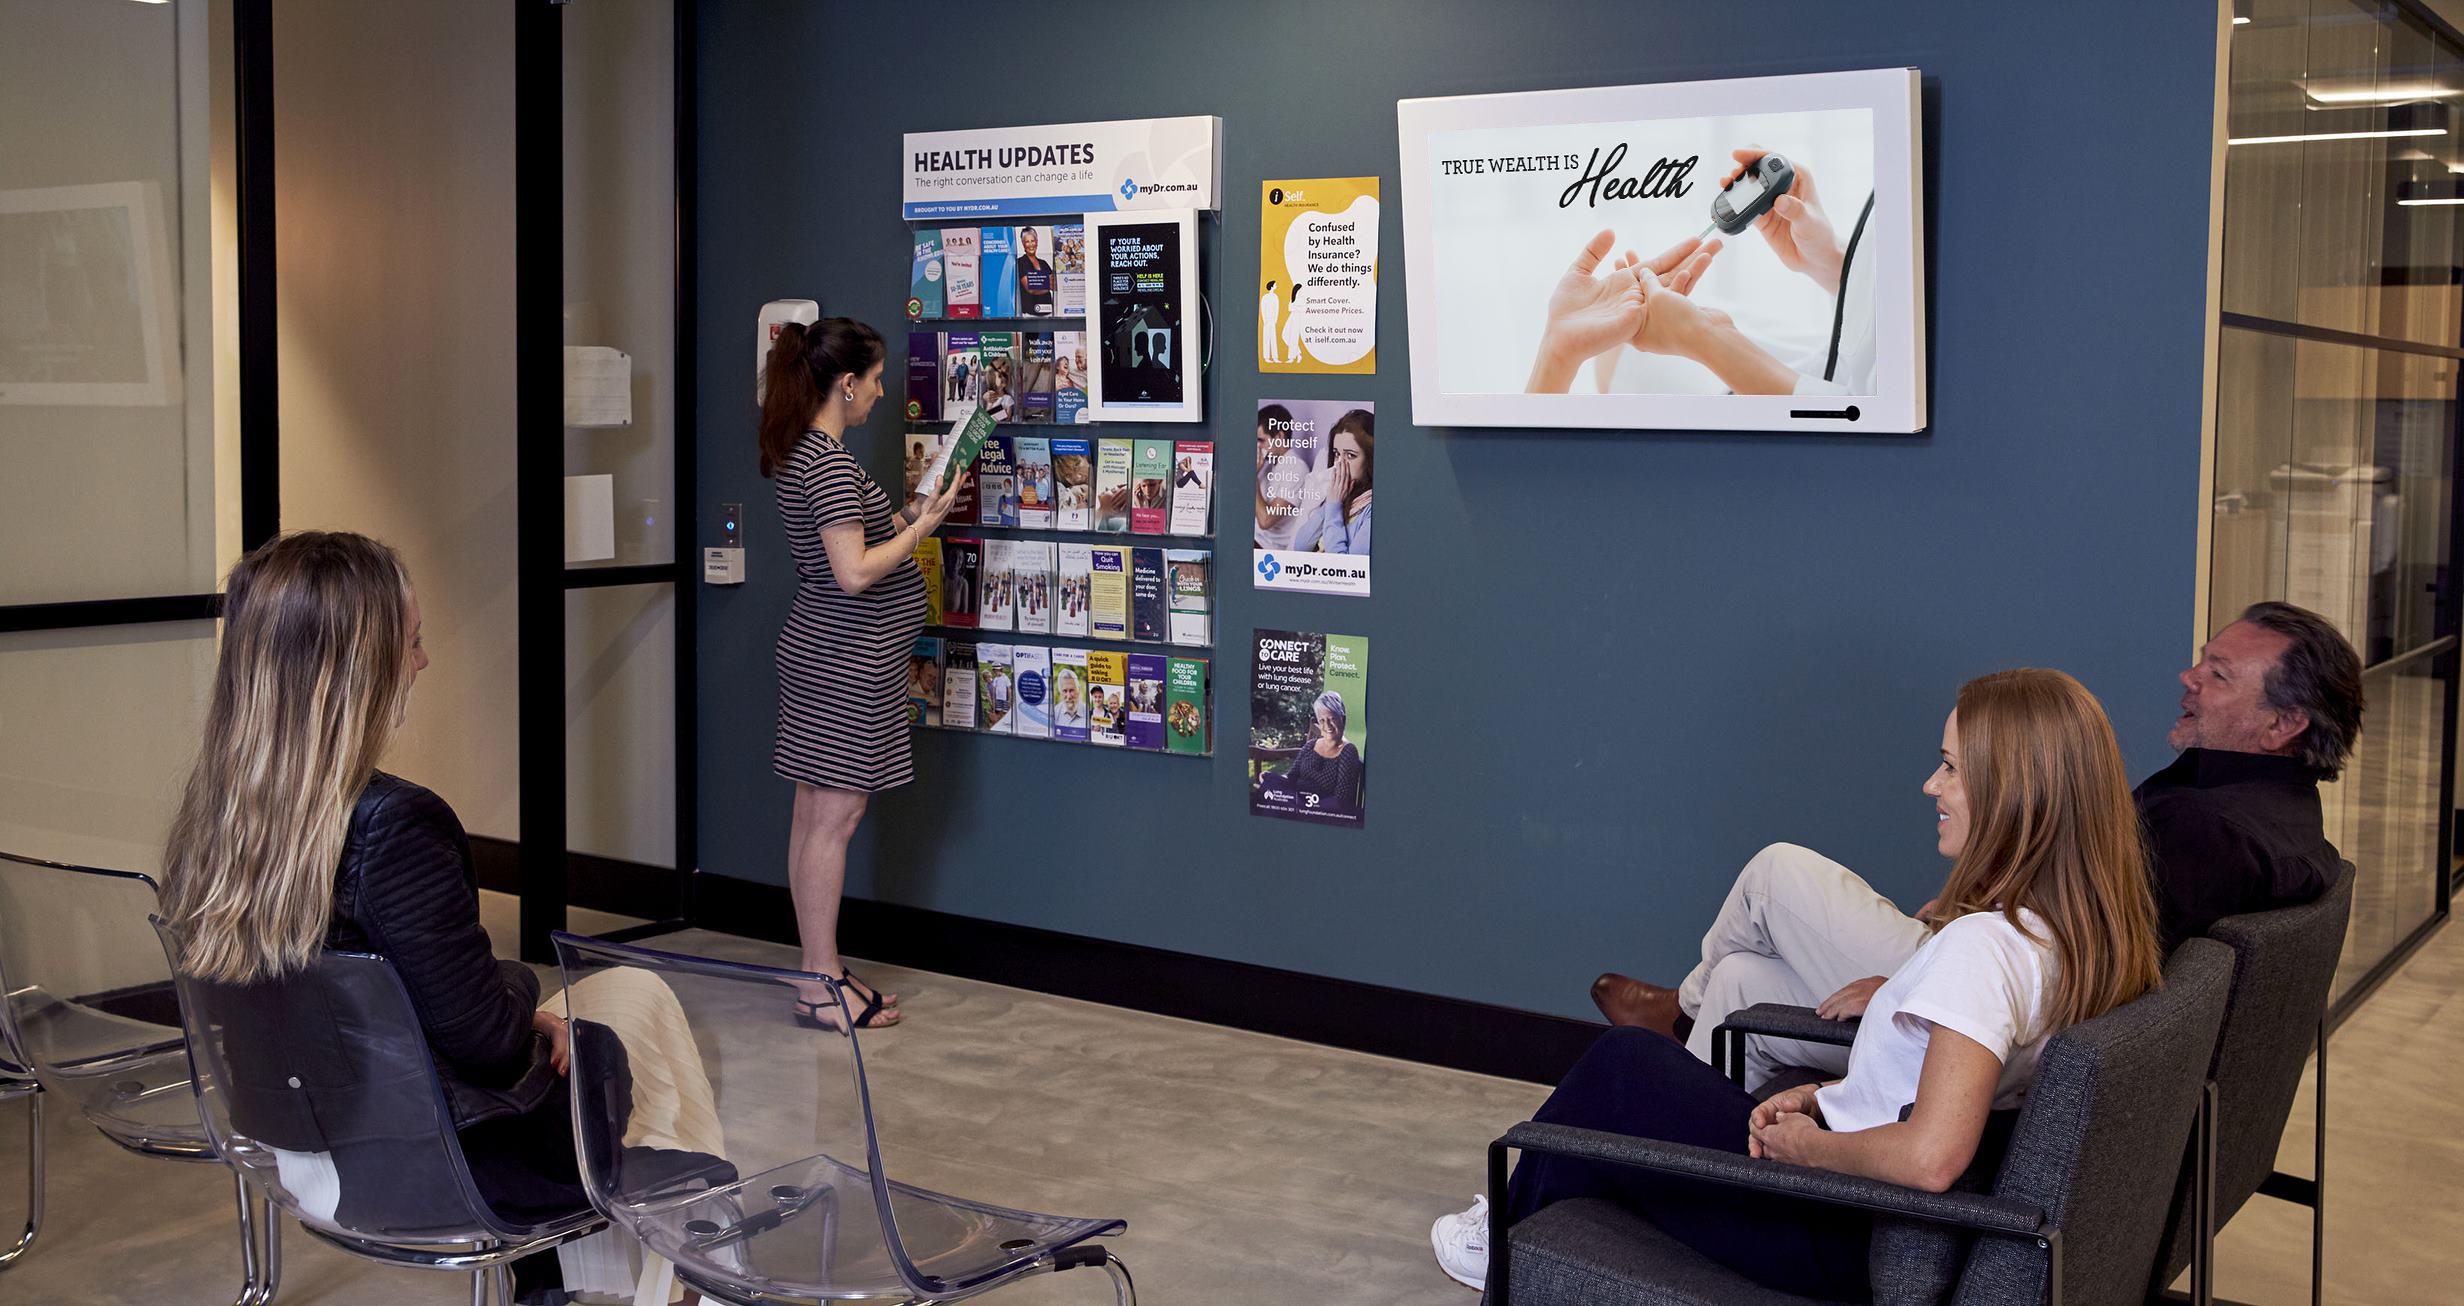 Tonic Media DOOH screen inside of a doctor's waiting room